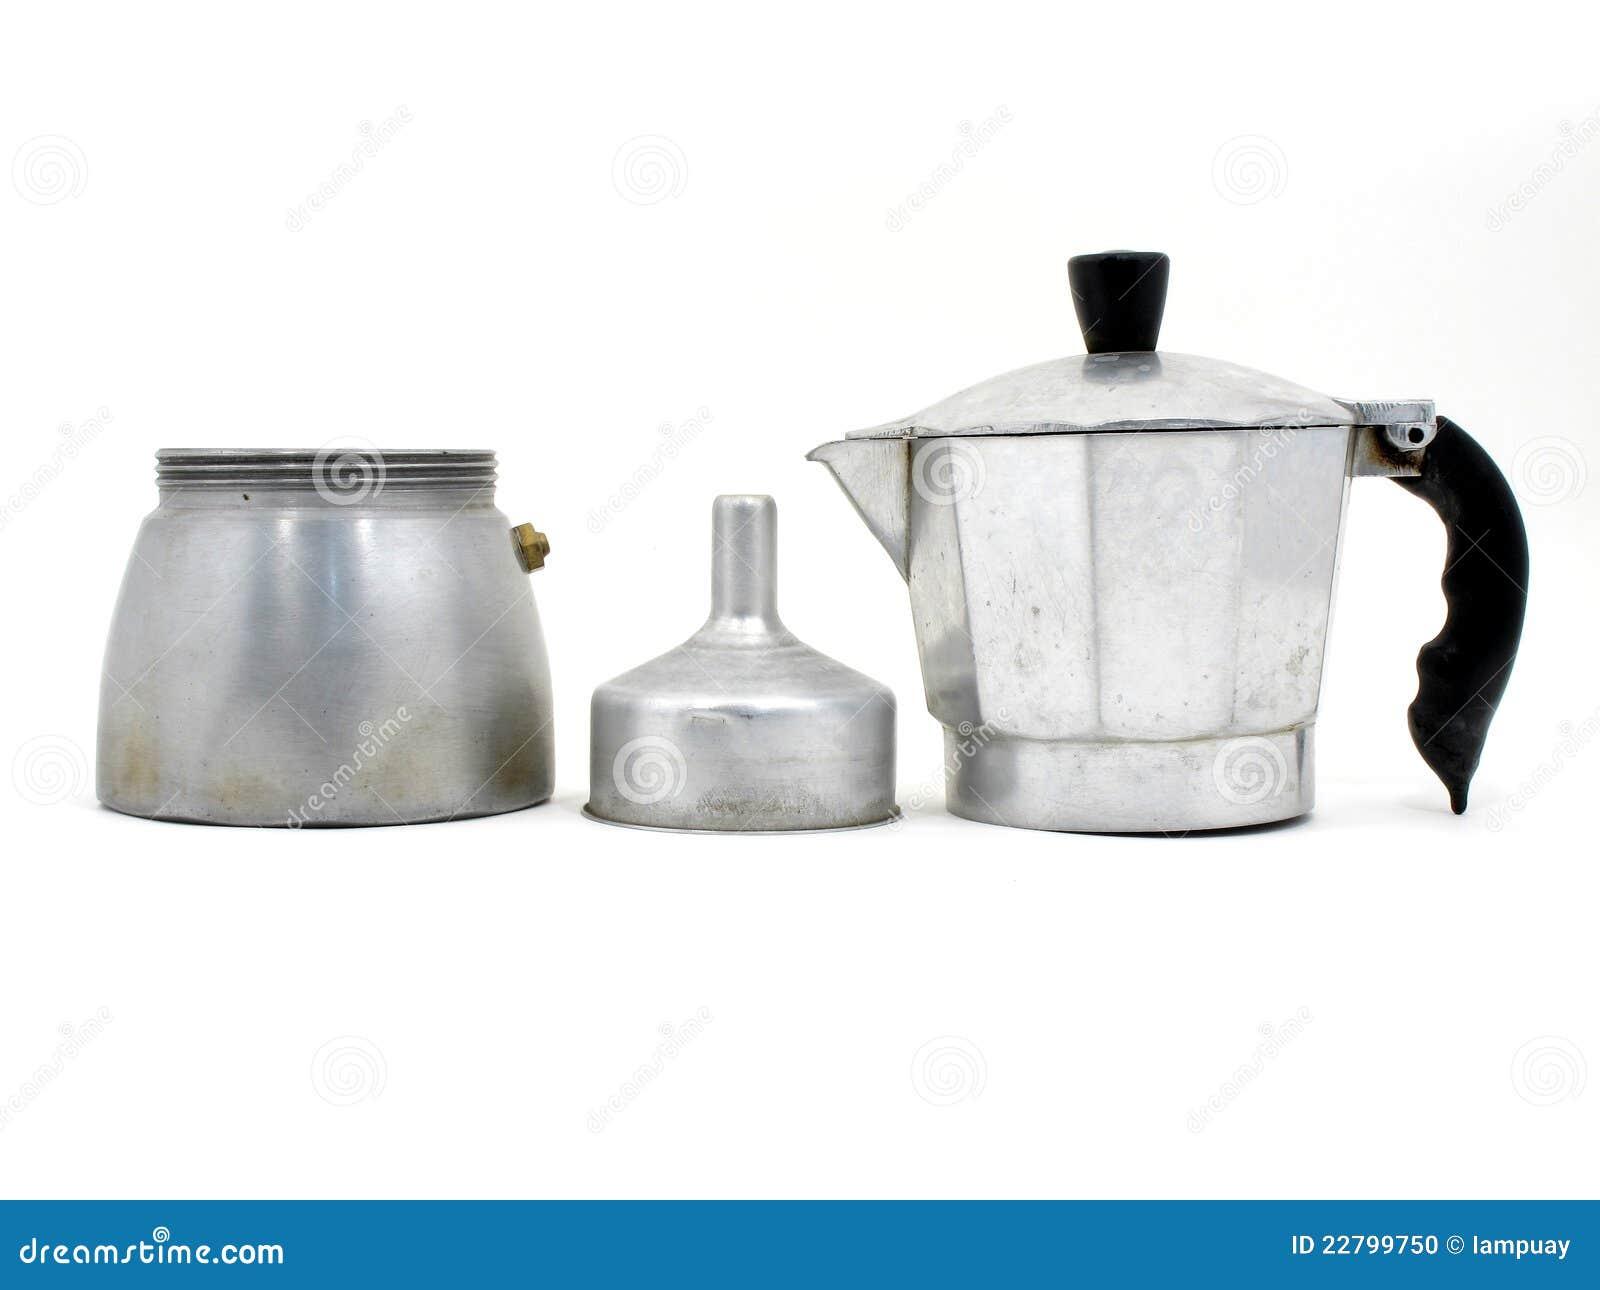 Italian Coffee Maker Vector : Component Of Italian Coffee Maker Stock Photo - Image: 22799750